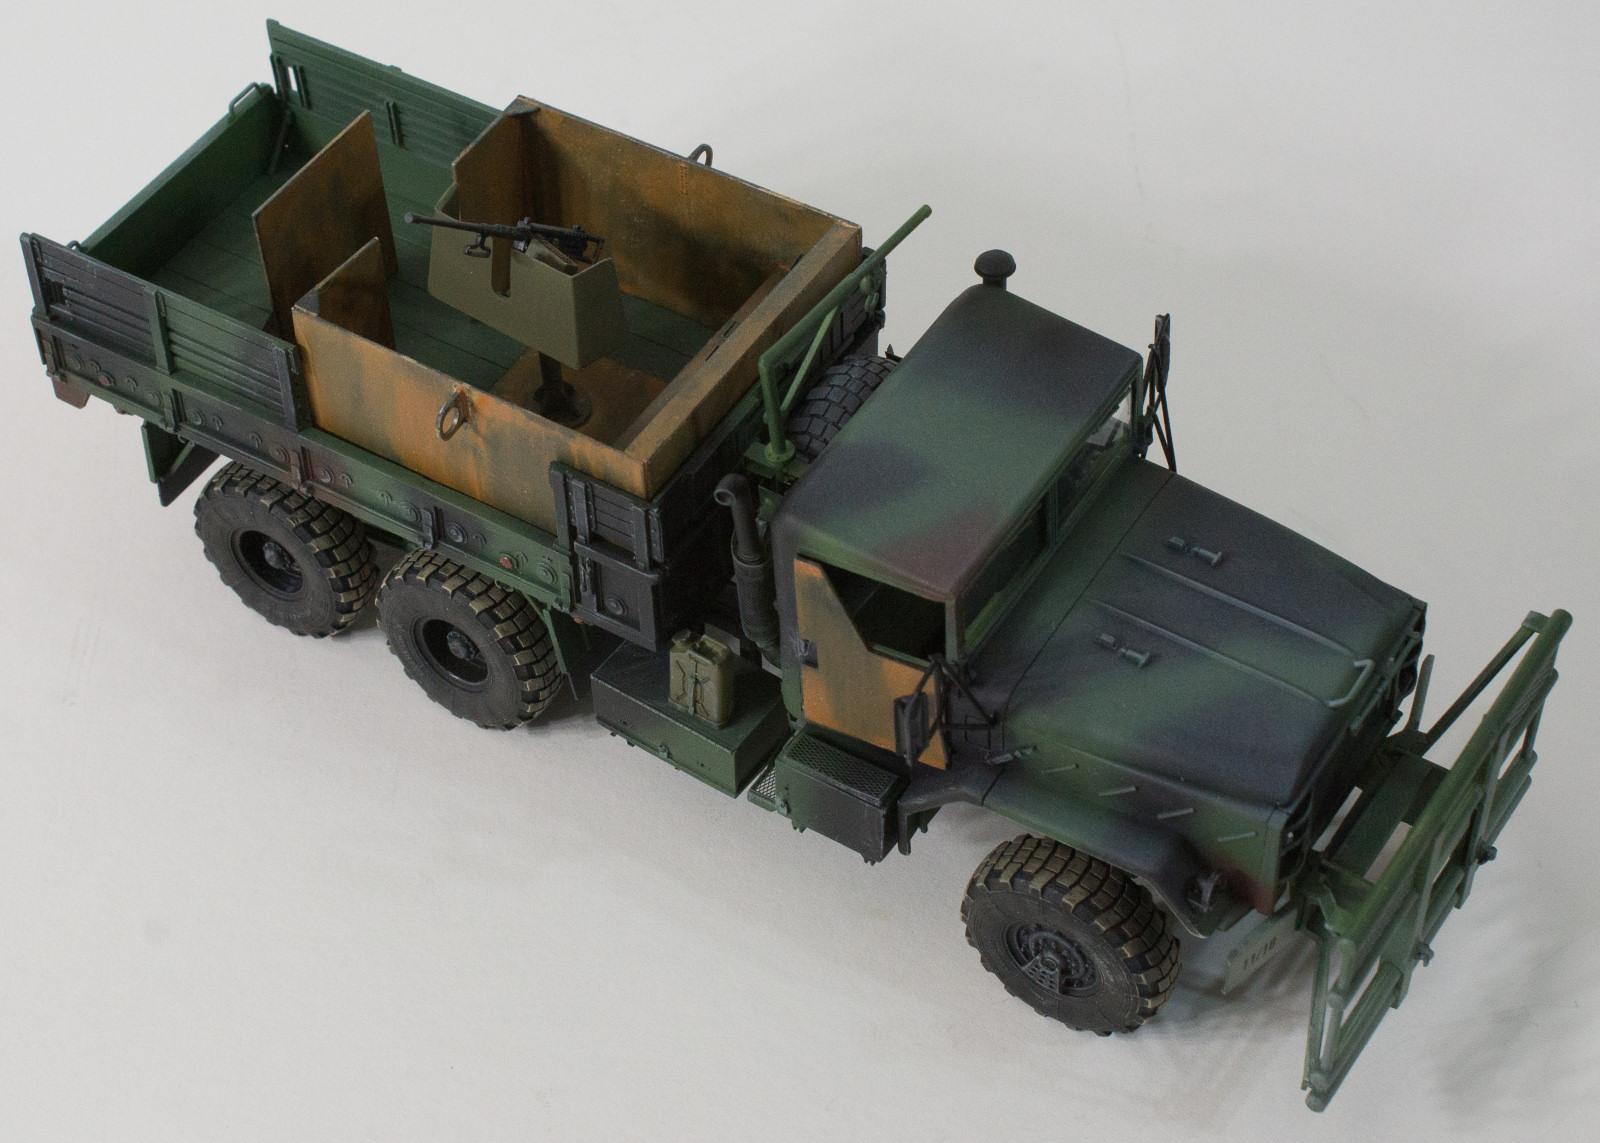 Italeri 6513 1 35 M923 Hillbilly Gun Truck Build Image 46